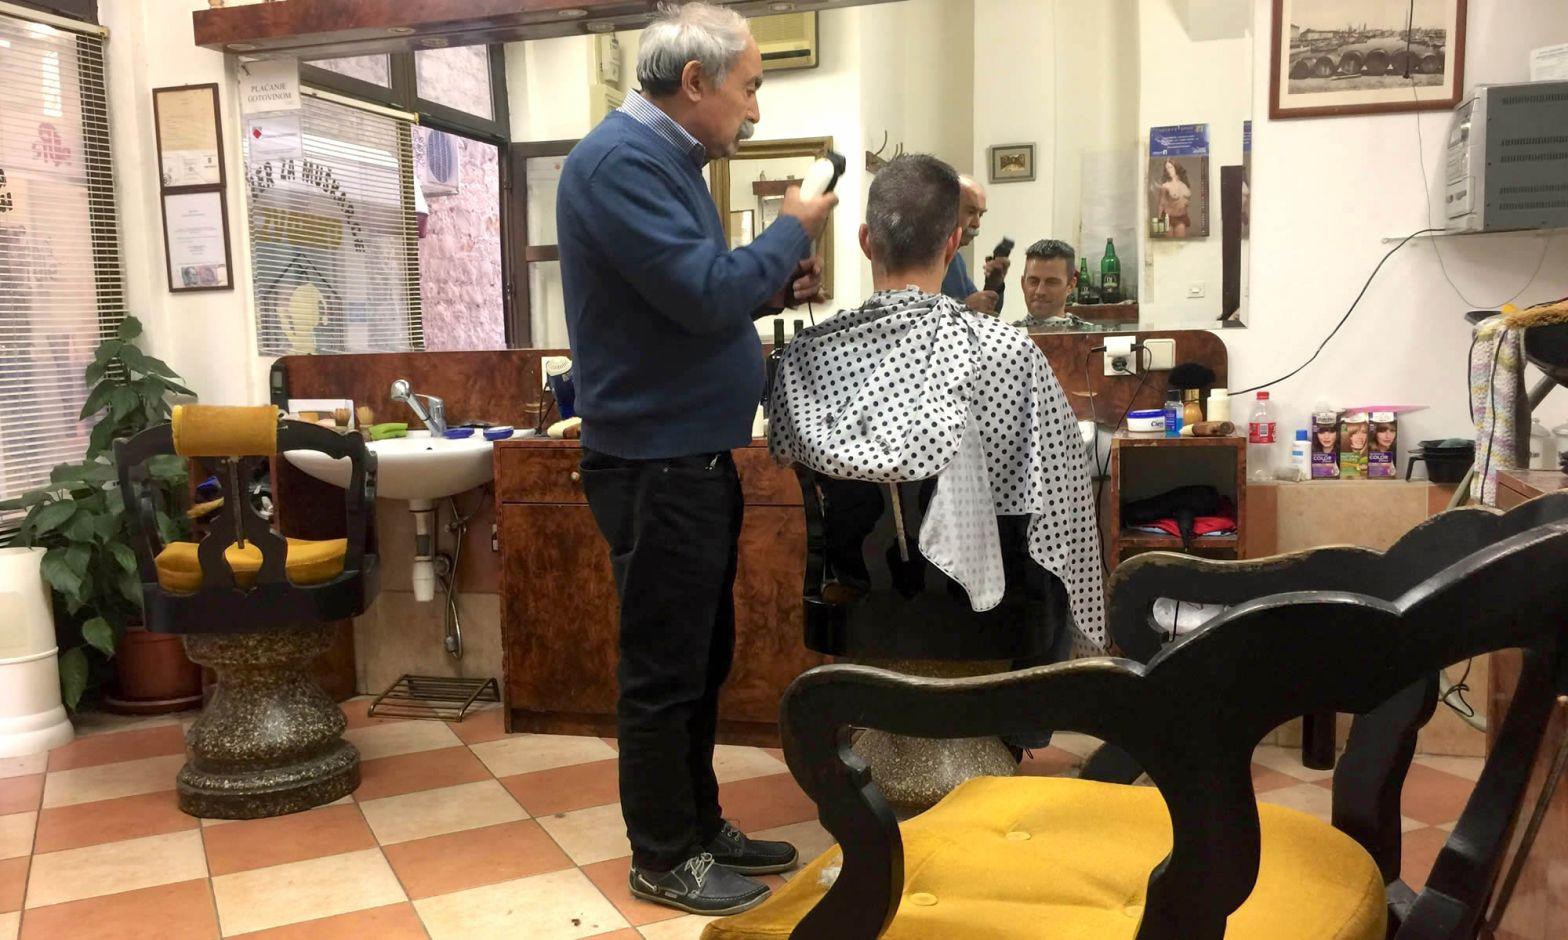 A man cuts a customer's hair at a barber shop in Split Croatia